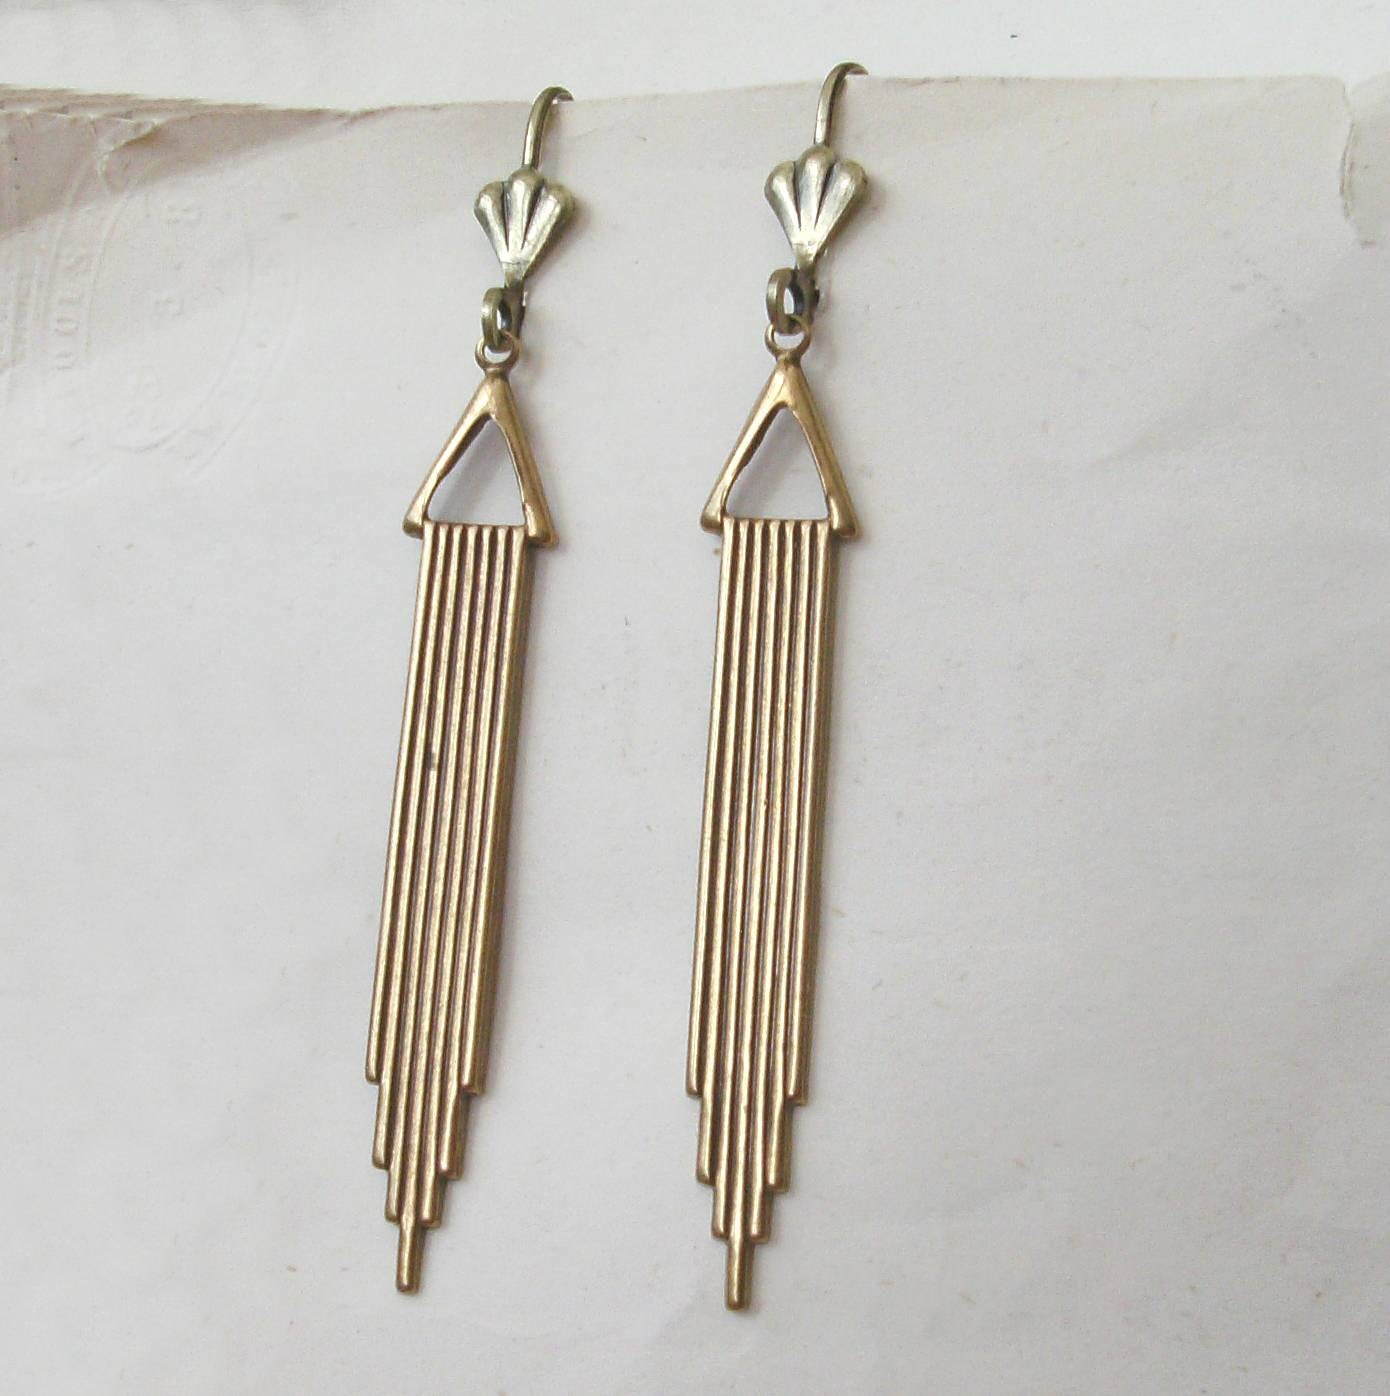 gold art deco earrings antiqued gold deco wedding choose. Black Bedroom Furniture Sets. Home Design Ideas